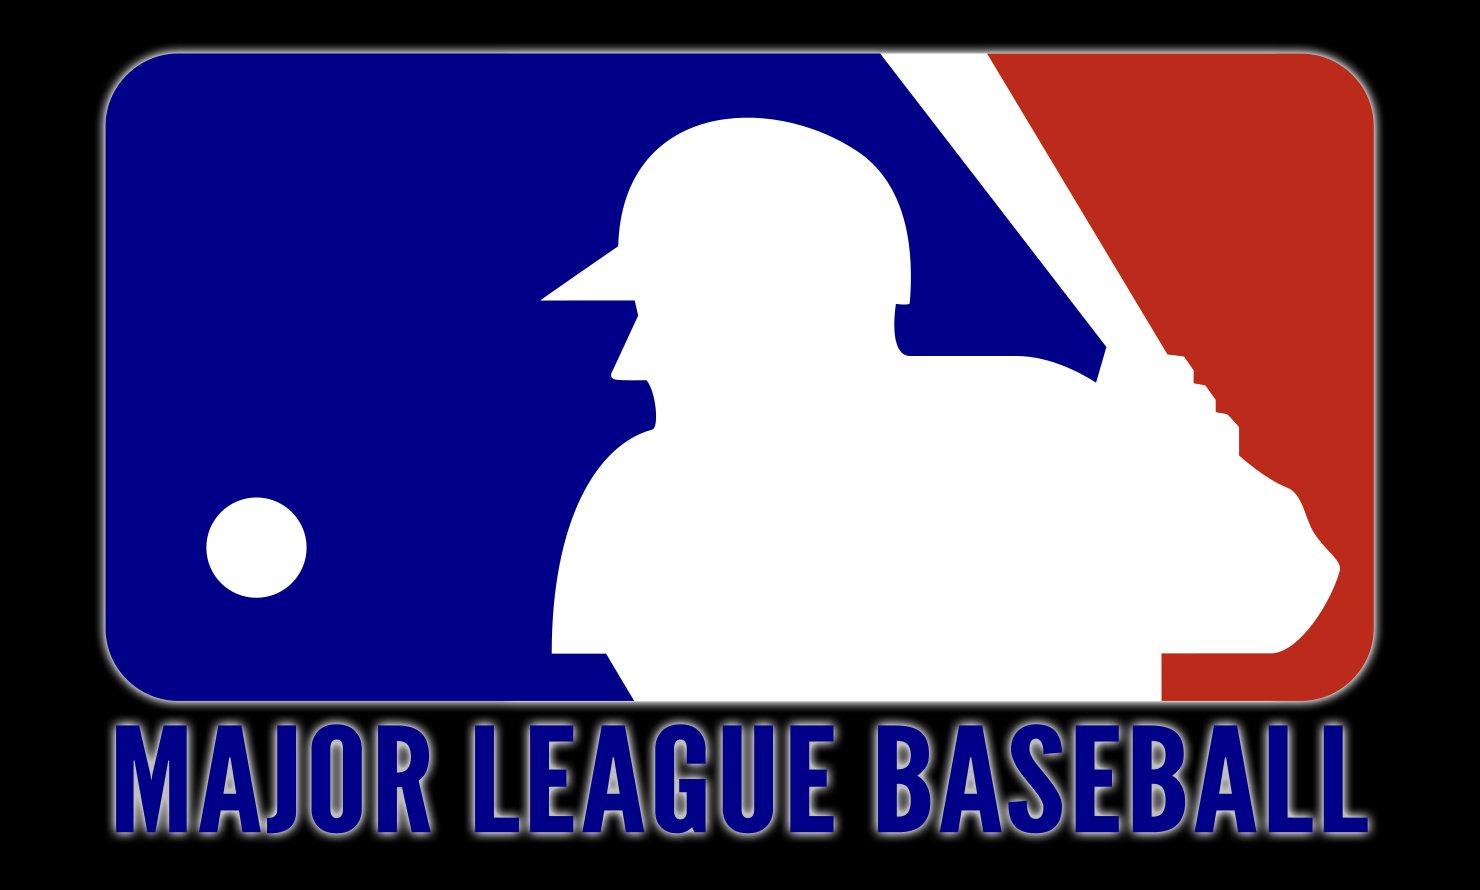 Major League Baseball logo and symbol, meaning, history, PNG